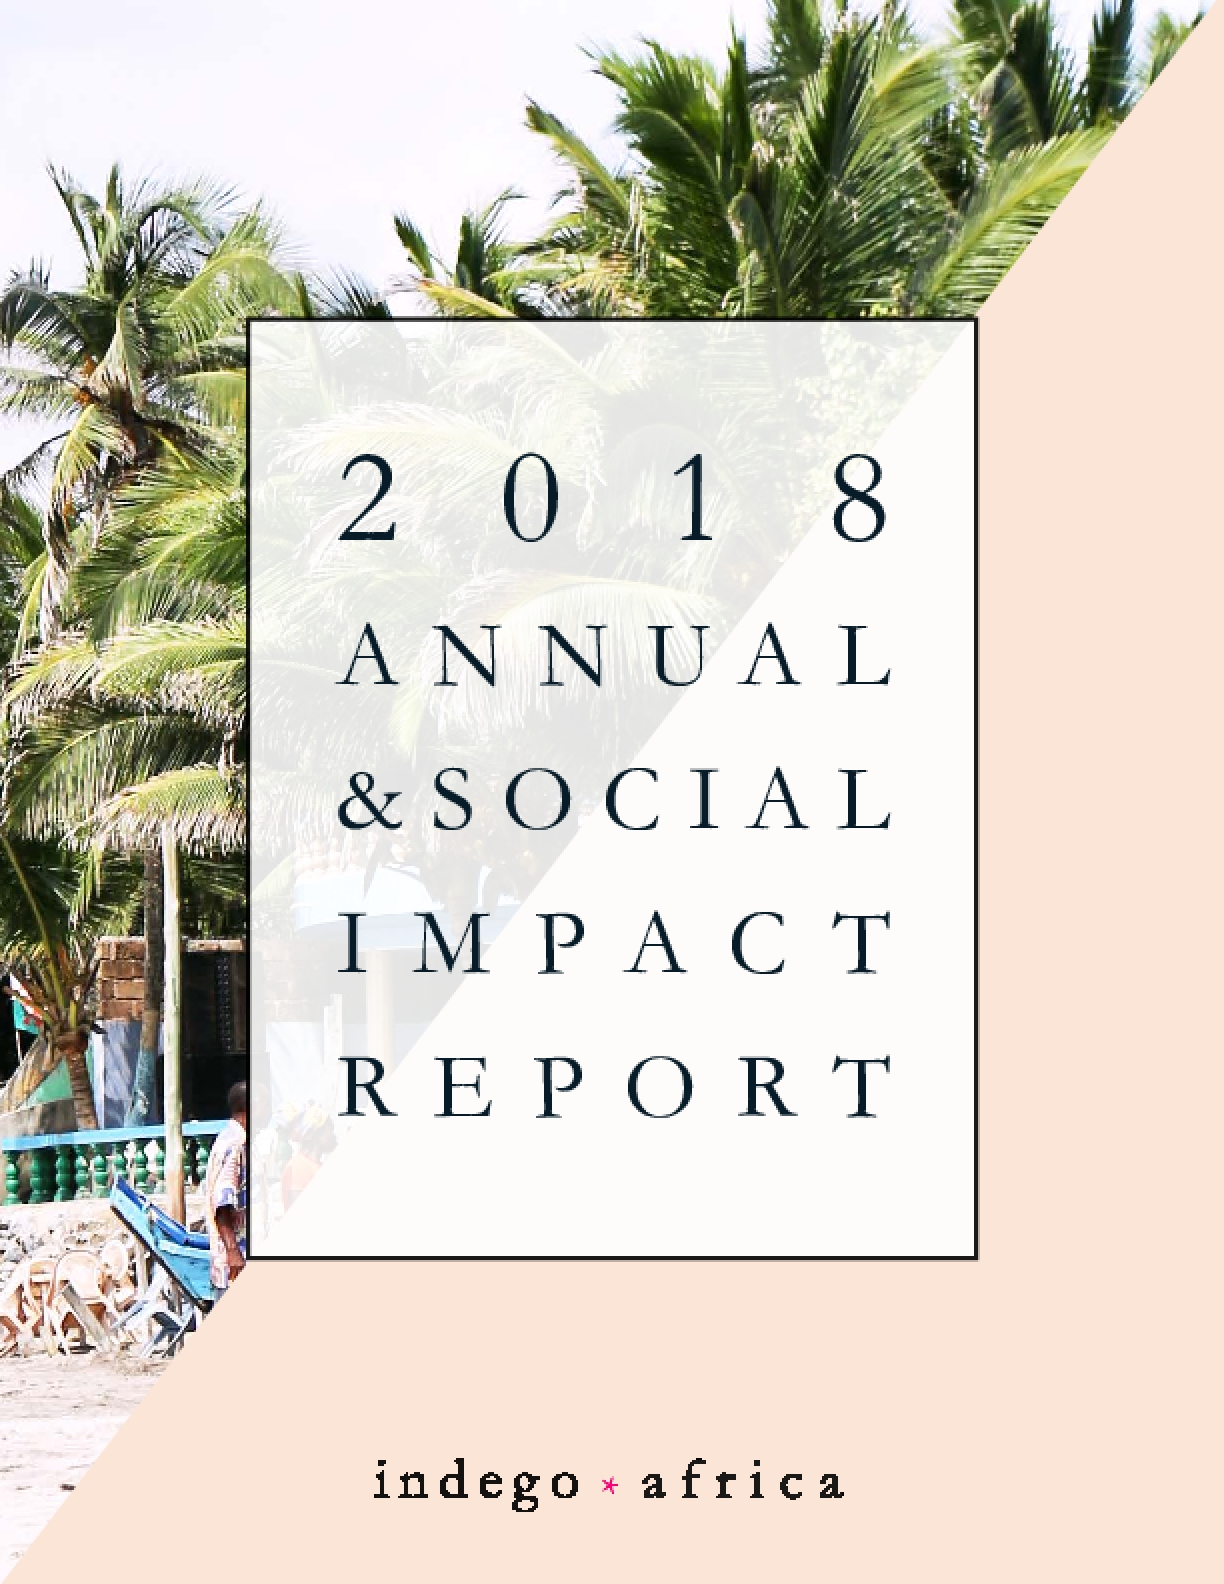 Annual & Social Impact Report 2018